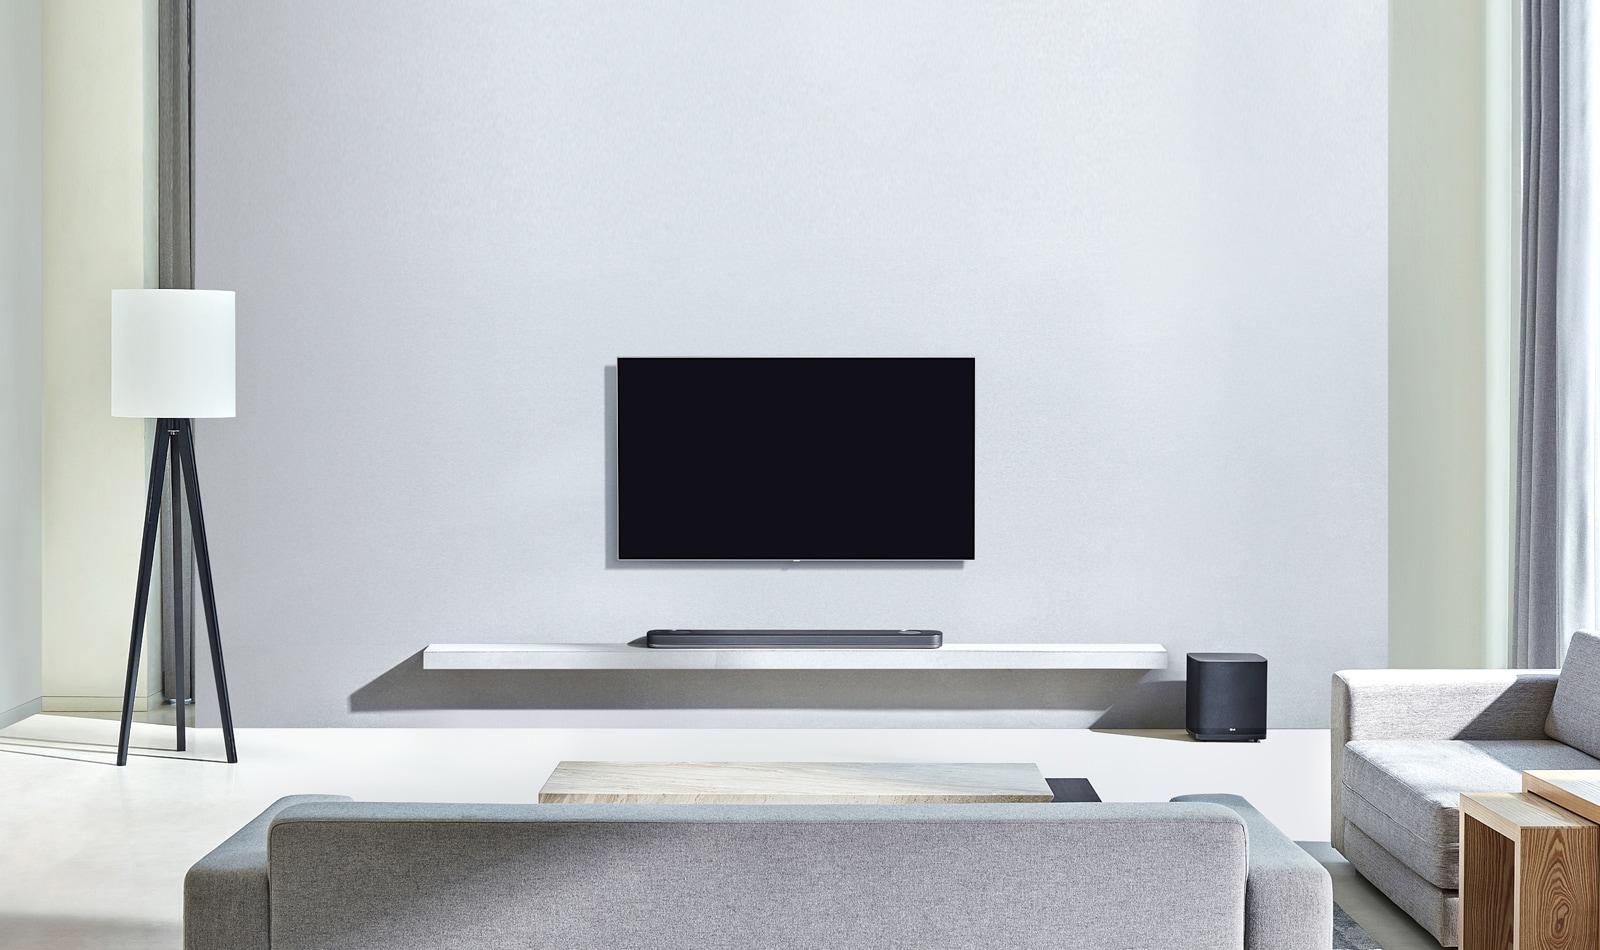 04_SJ9_TV_Matching_Design